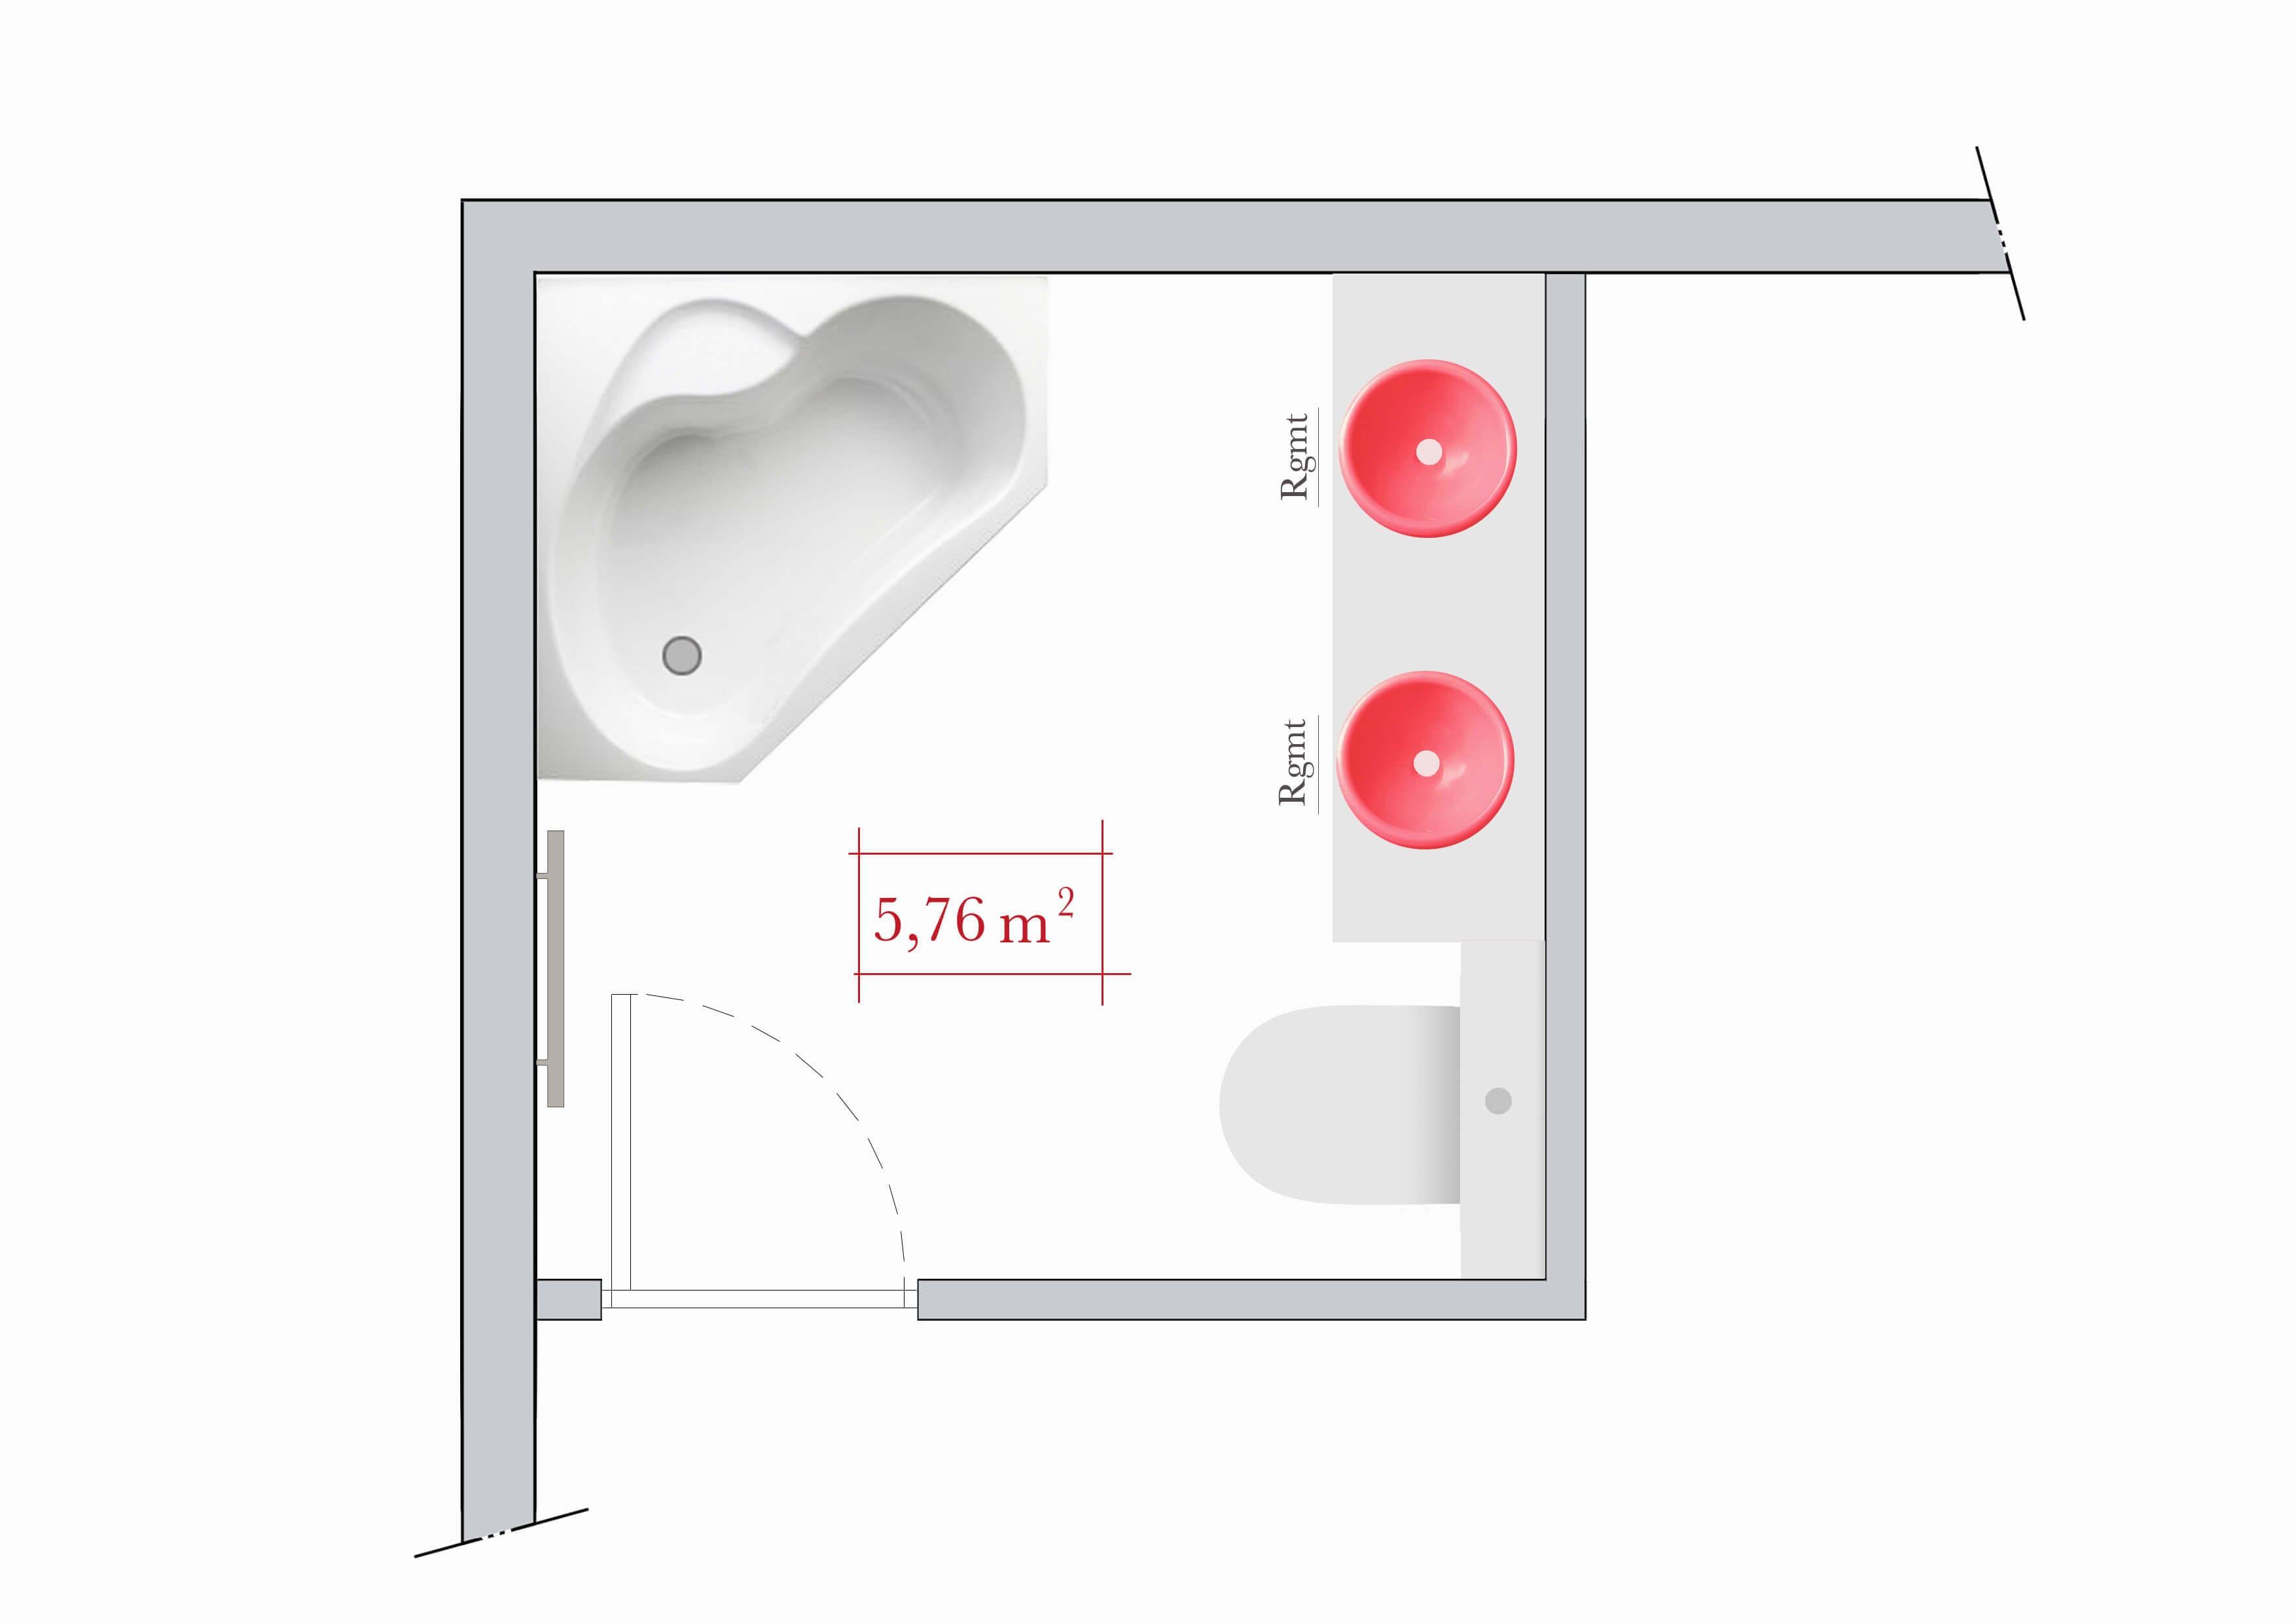 Plan agencement salle de bain 5m2